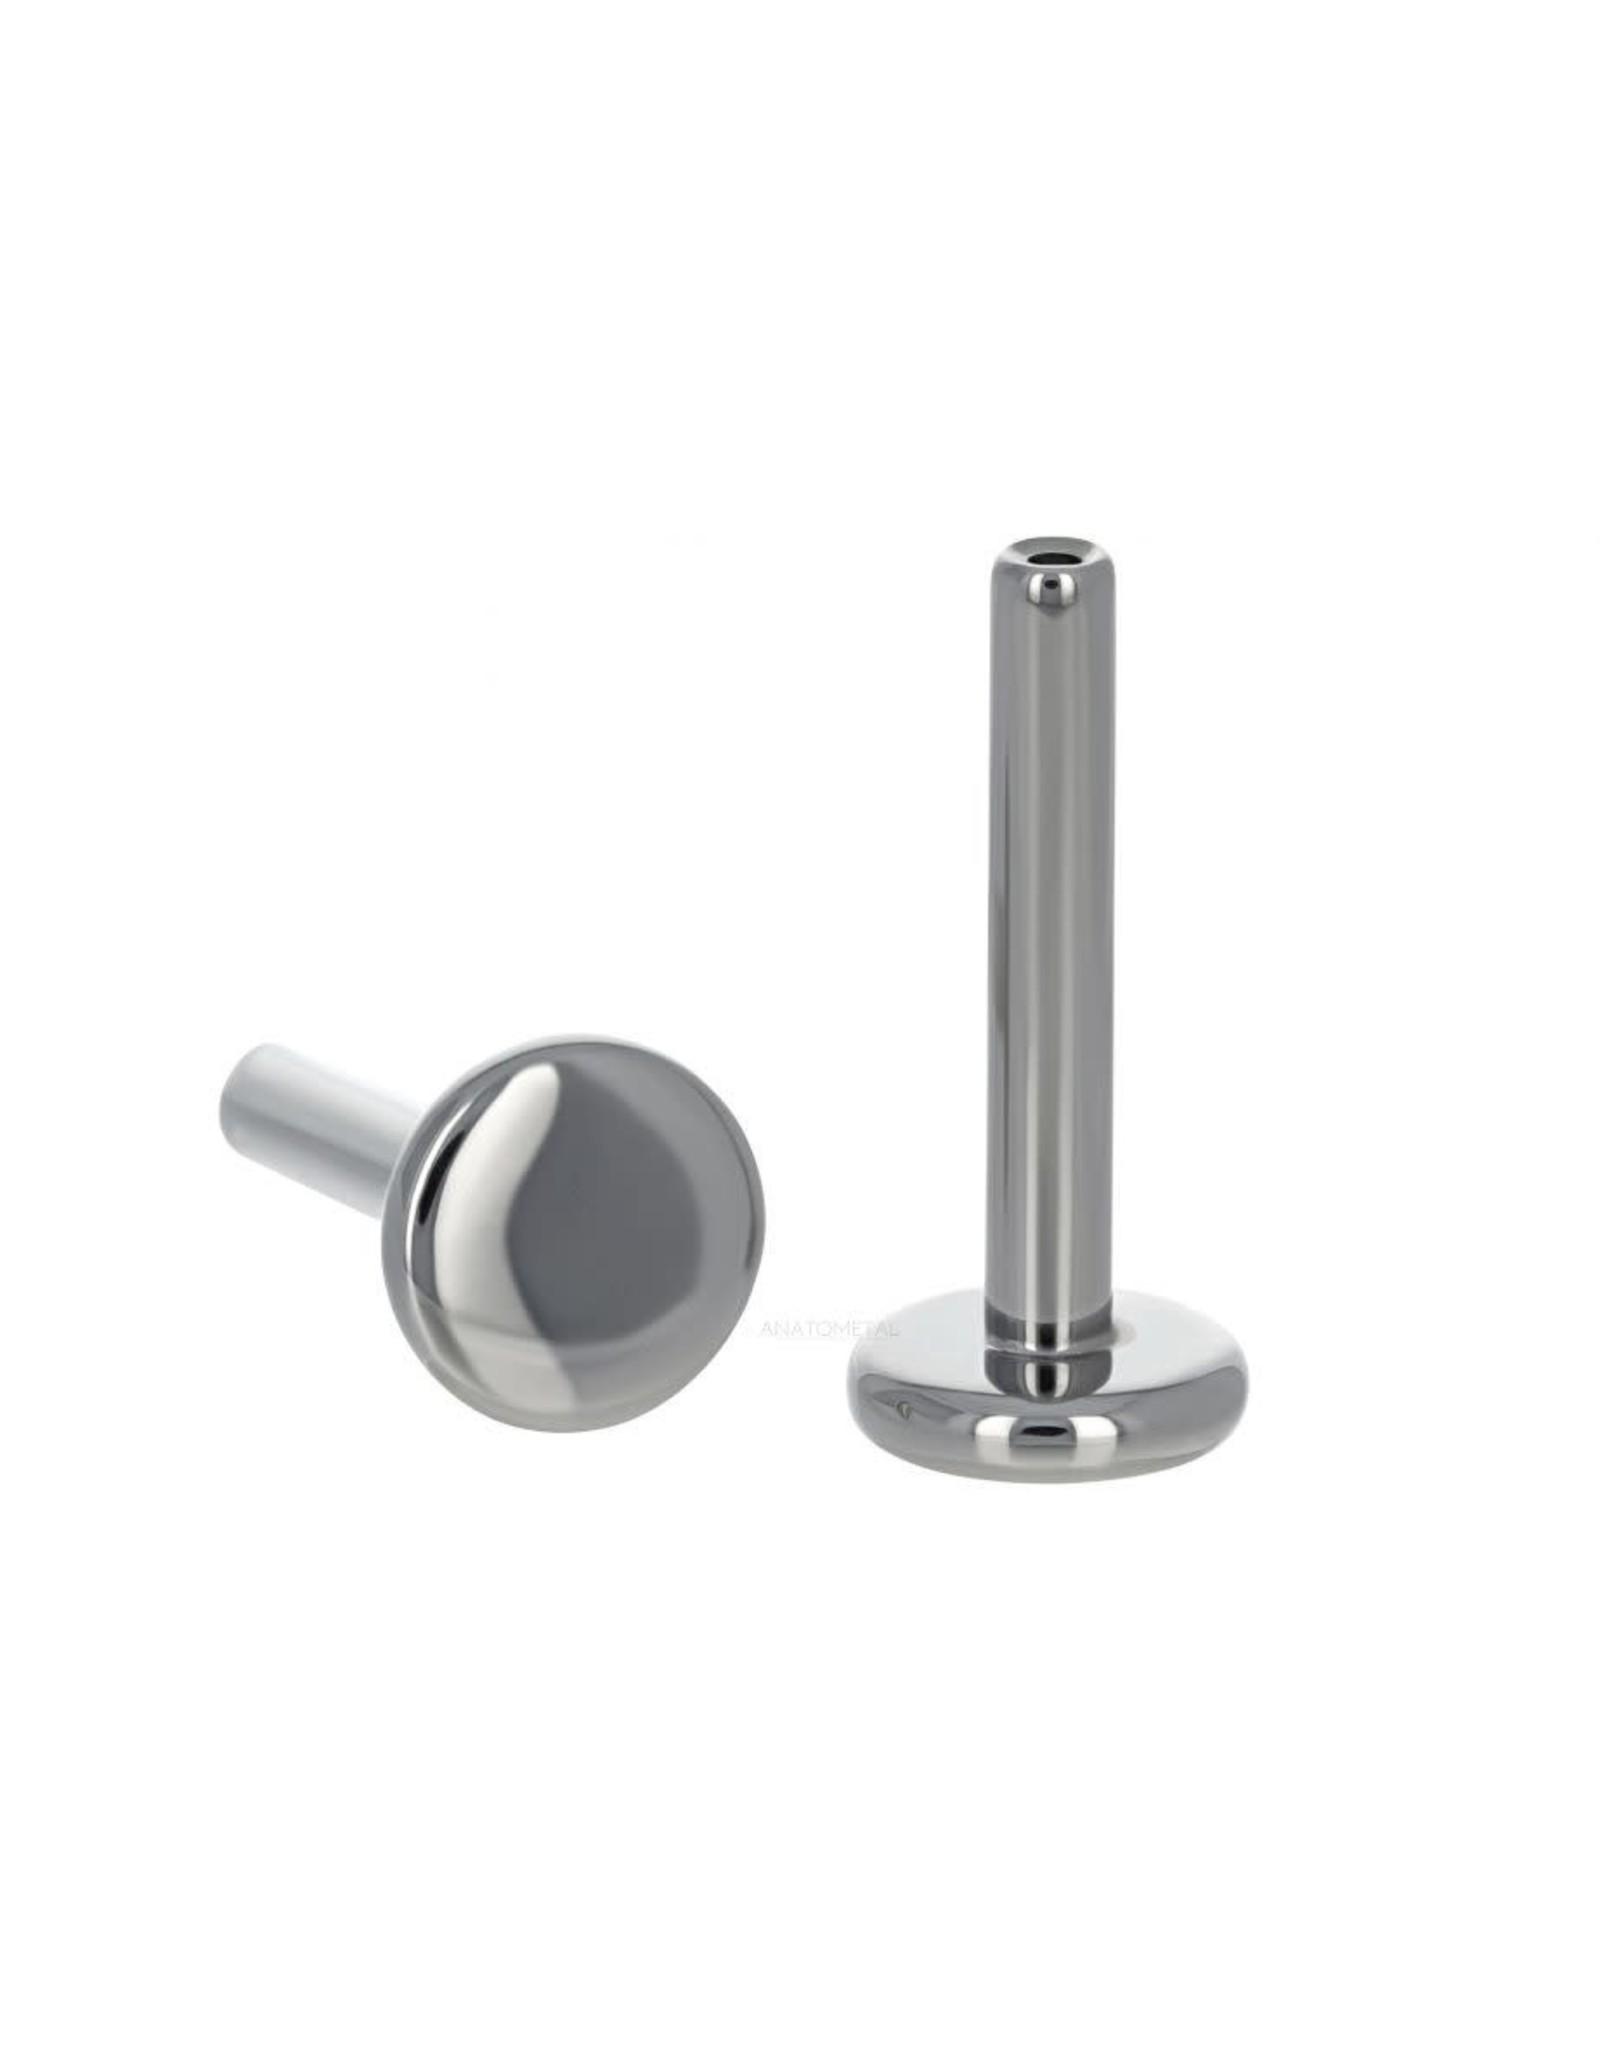 Anatometal 18g internally threaded titanium flatback with 3.0 disk